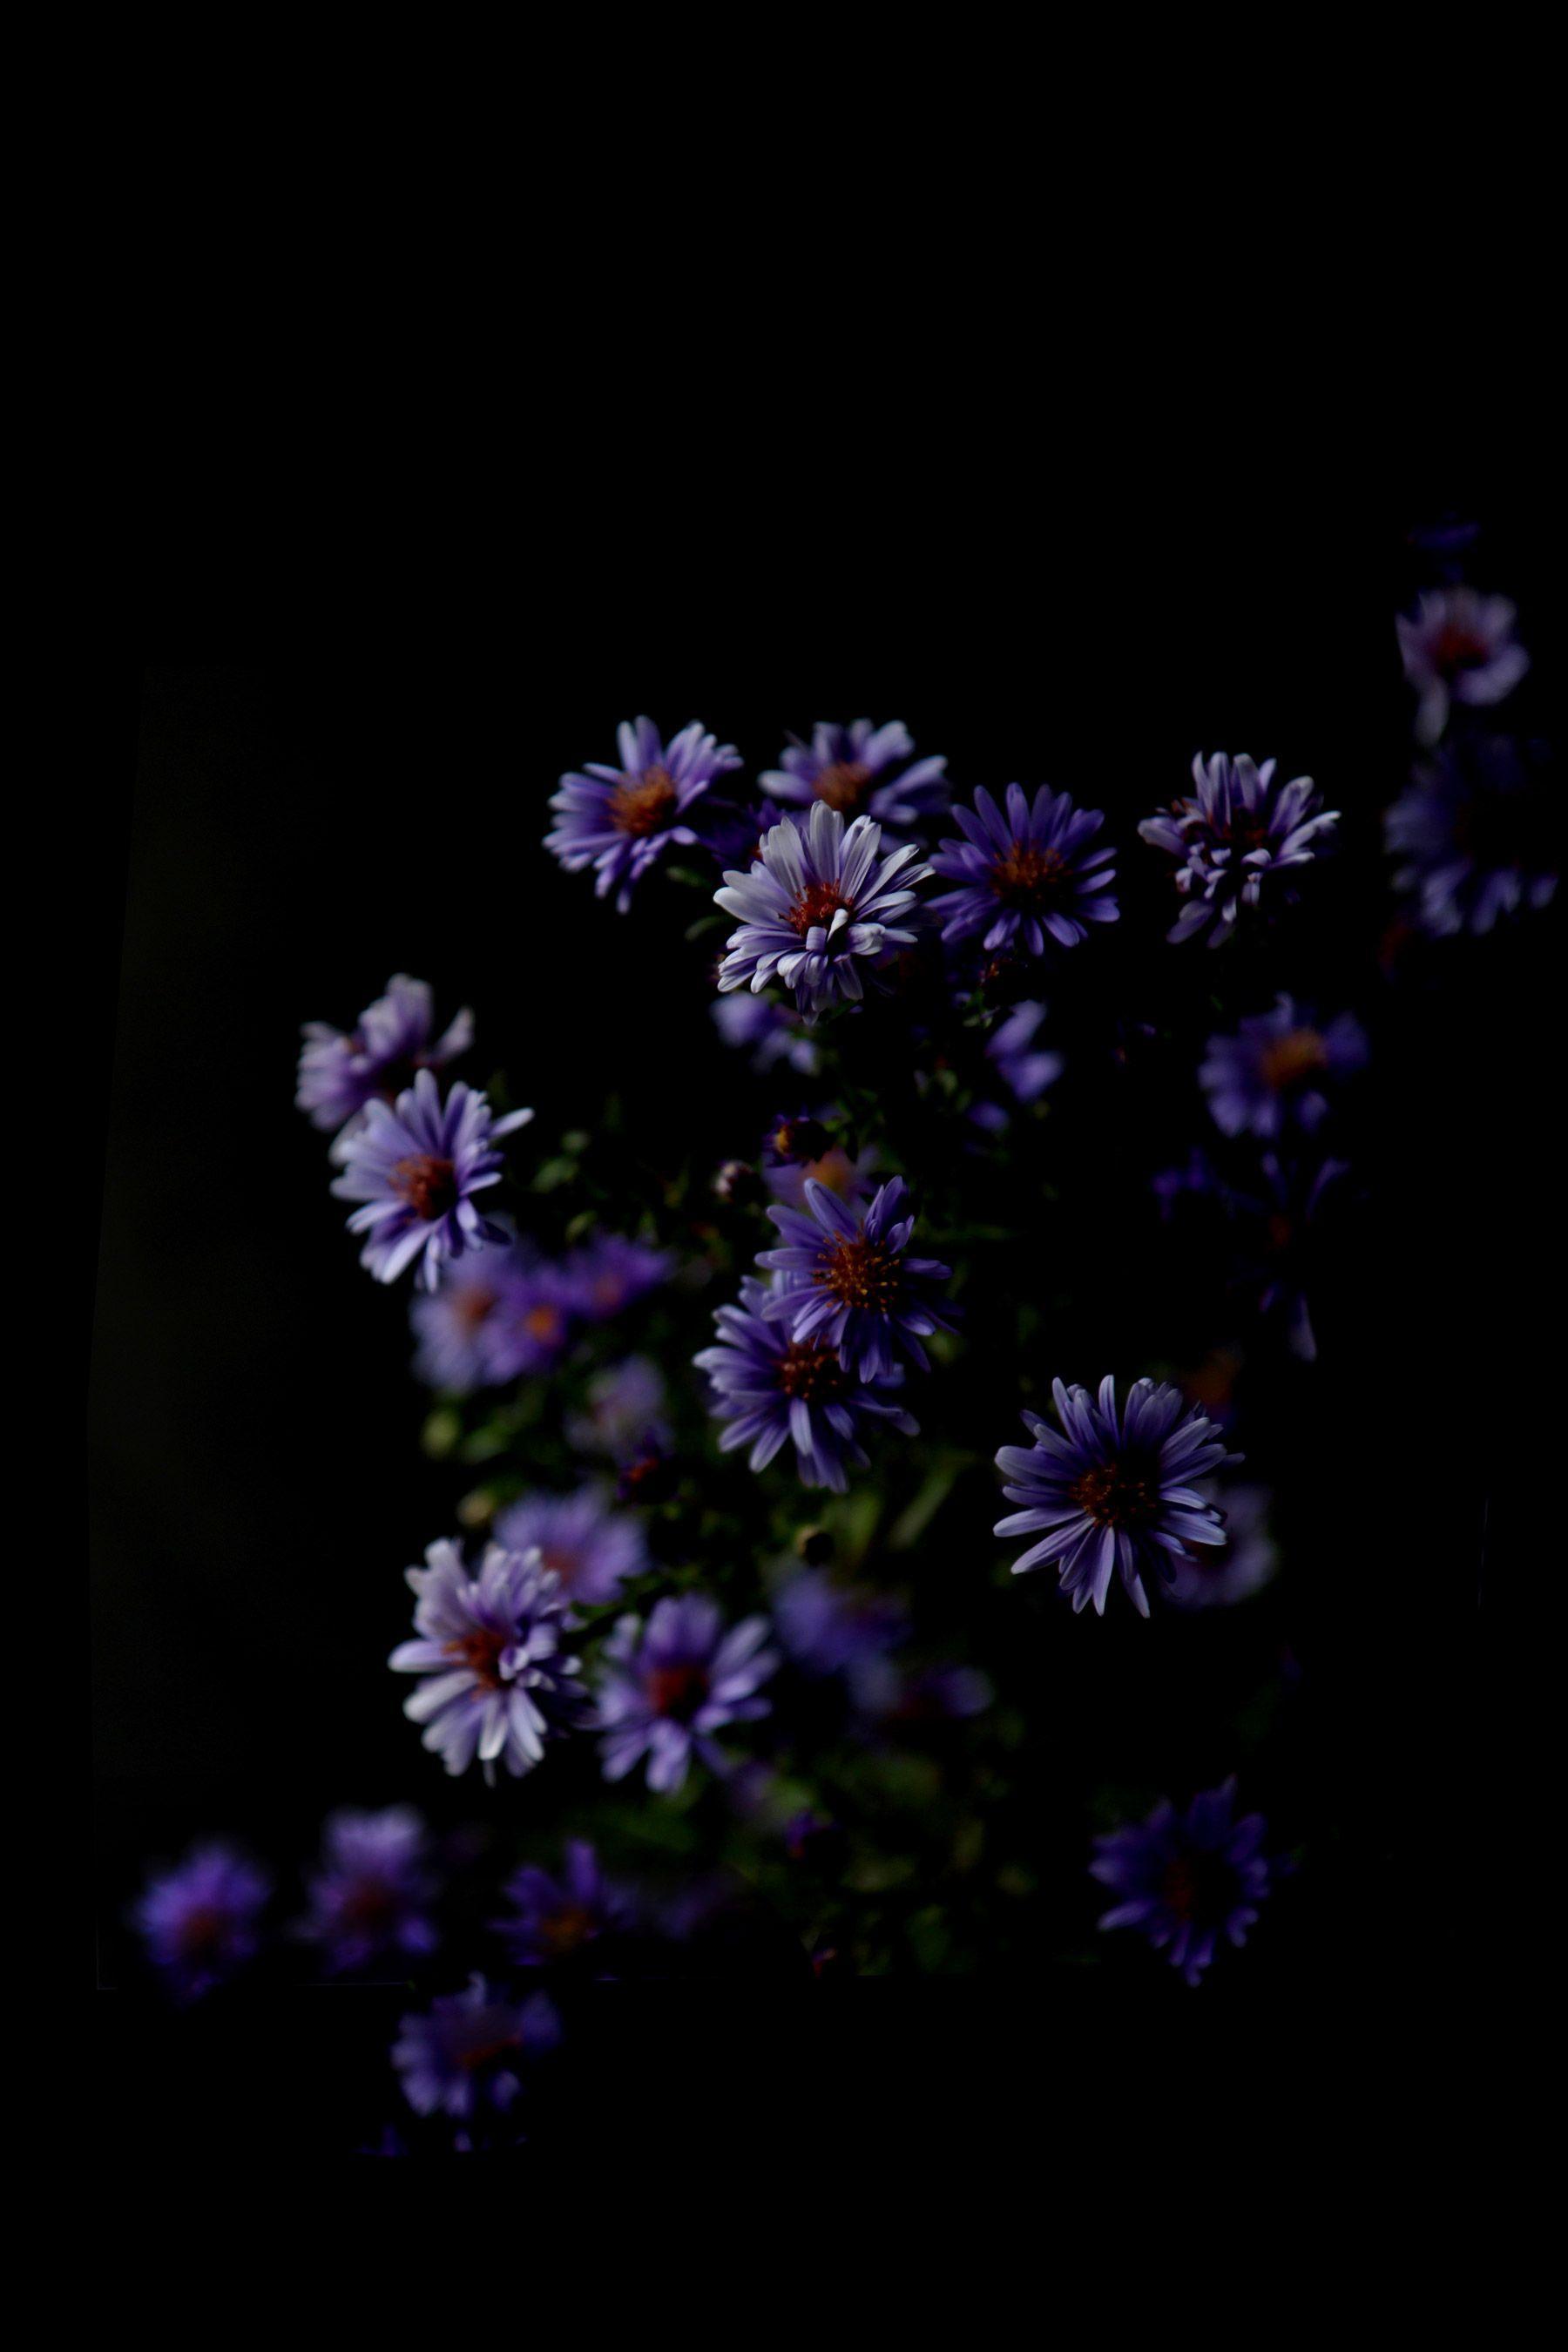 Flower Aesthetic Dark Wallpapers - Wallpaper Cave